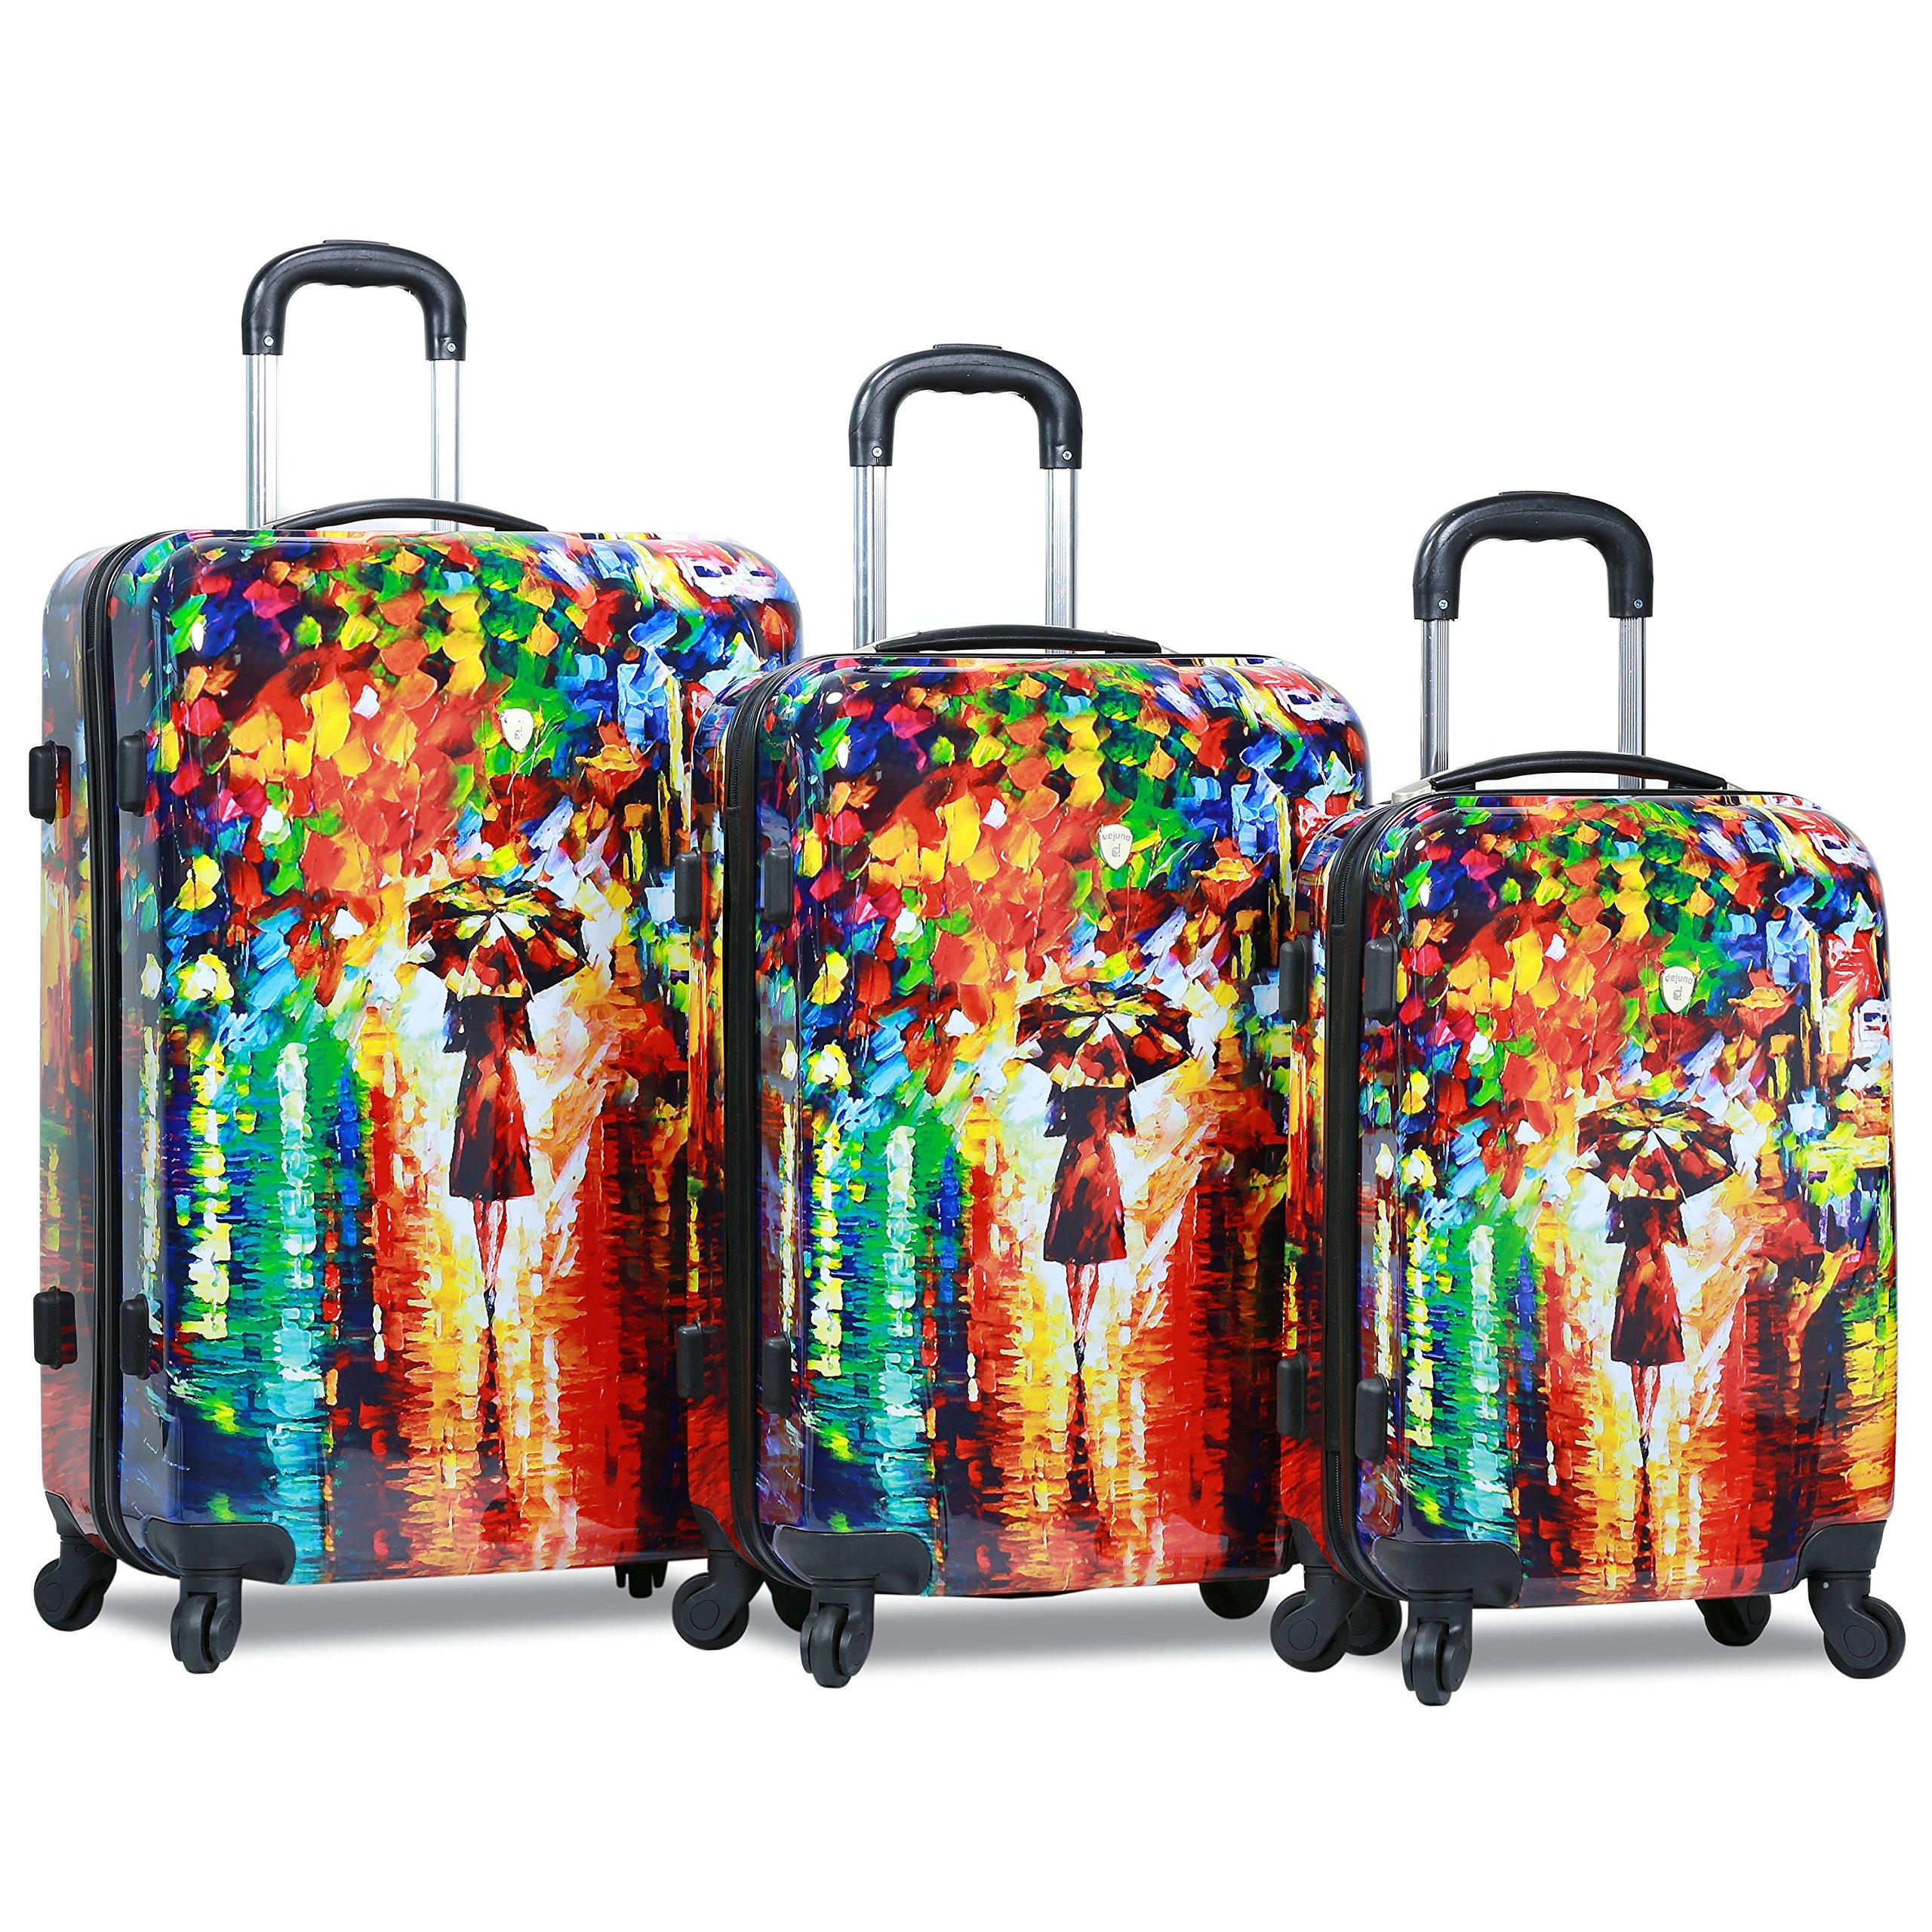 Dejuno 3-Piece Lightweight Hardside Spinner Upright Luggage Set, Parisian Nights by Dejuno